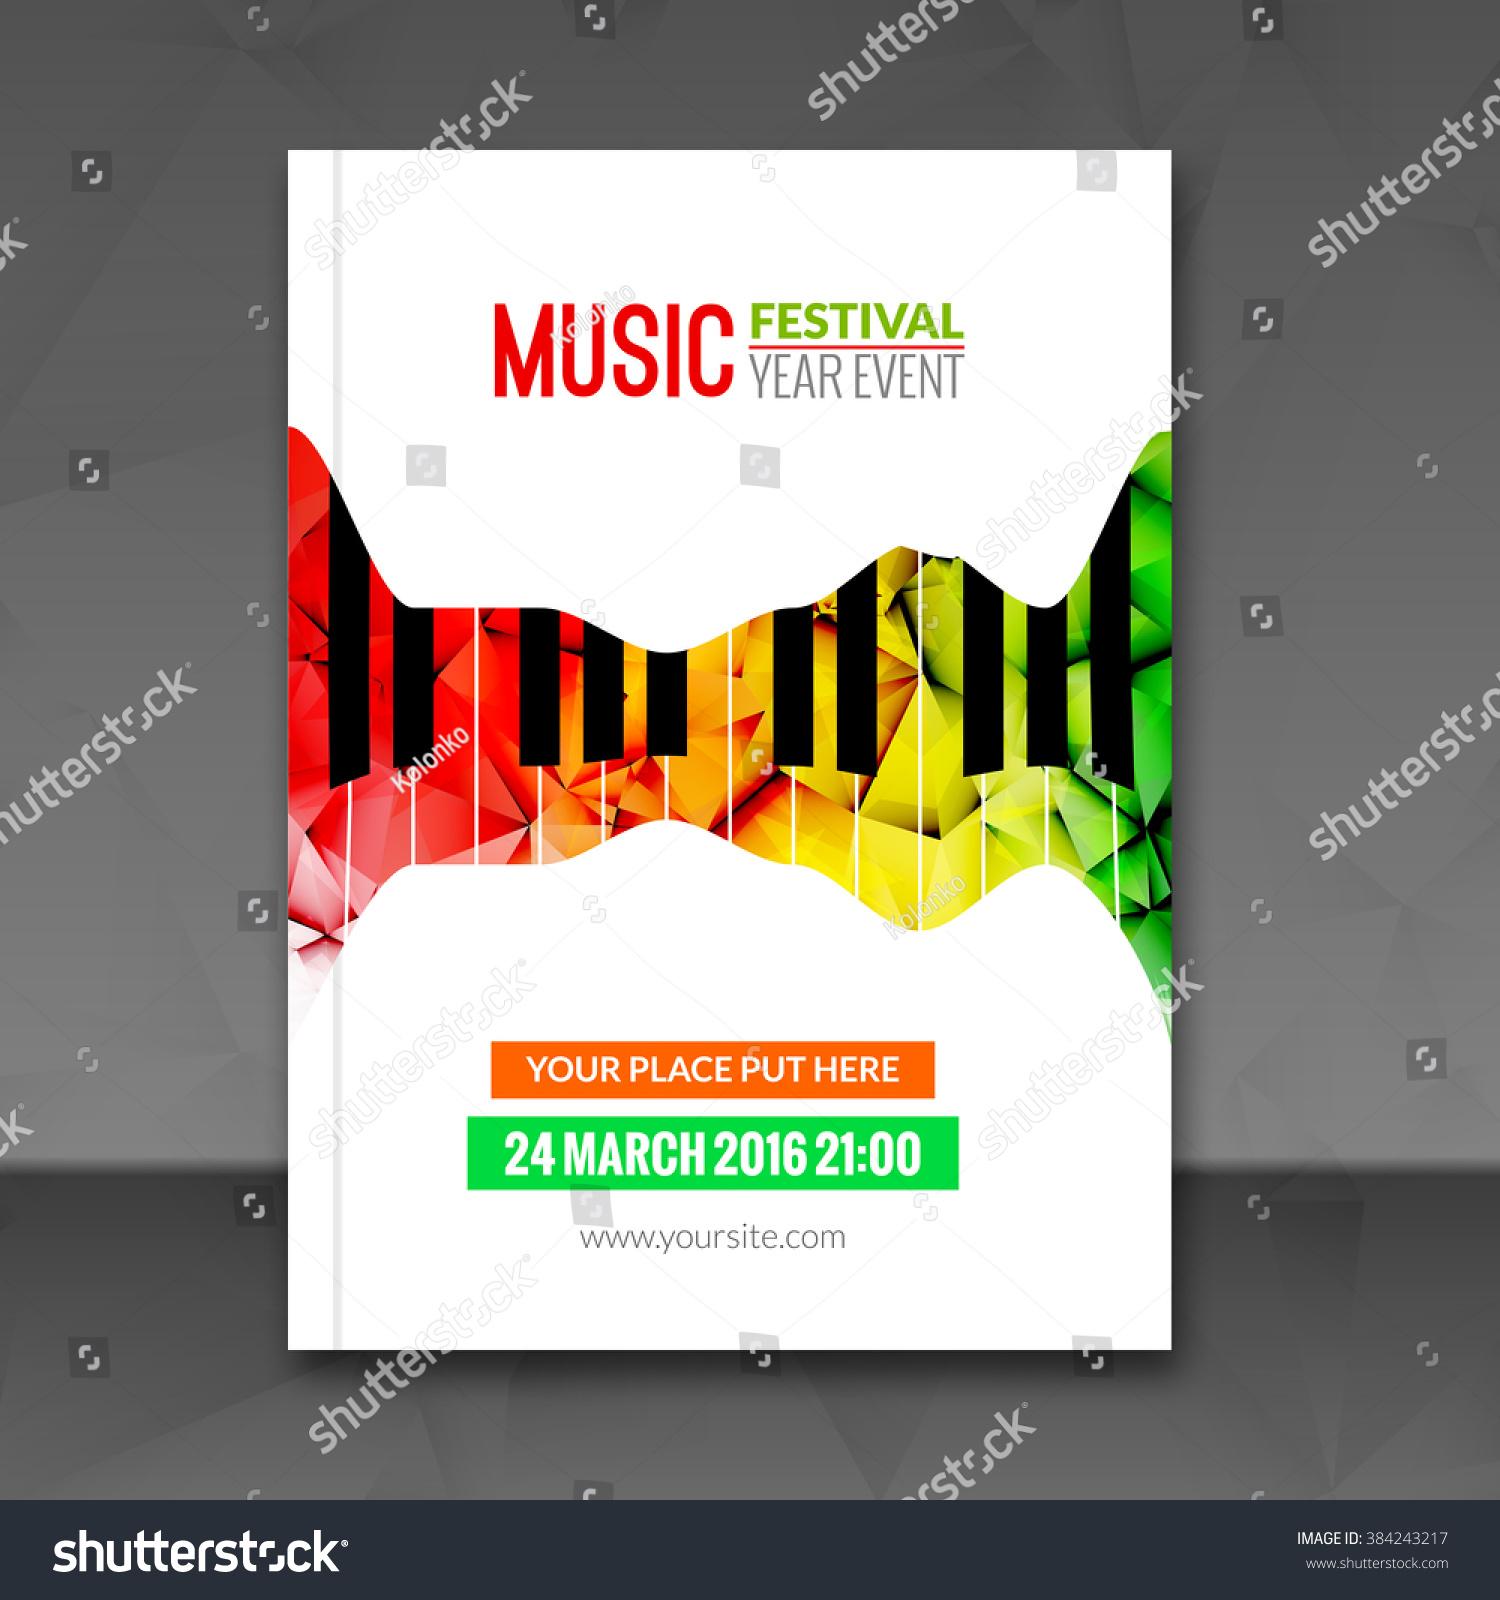 music festival poster background flyer template stock vector music festival poster background flyer template jazz piano music flyer cafe promotional design